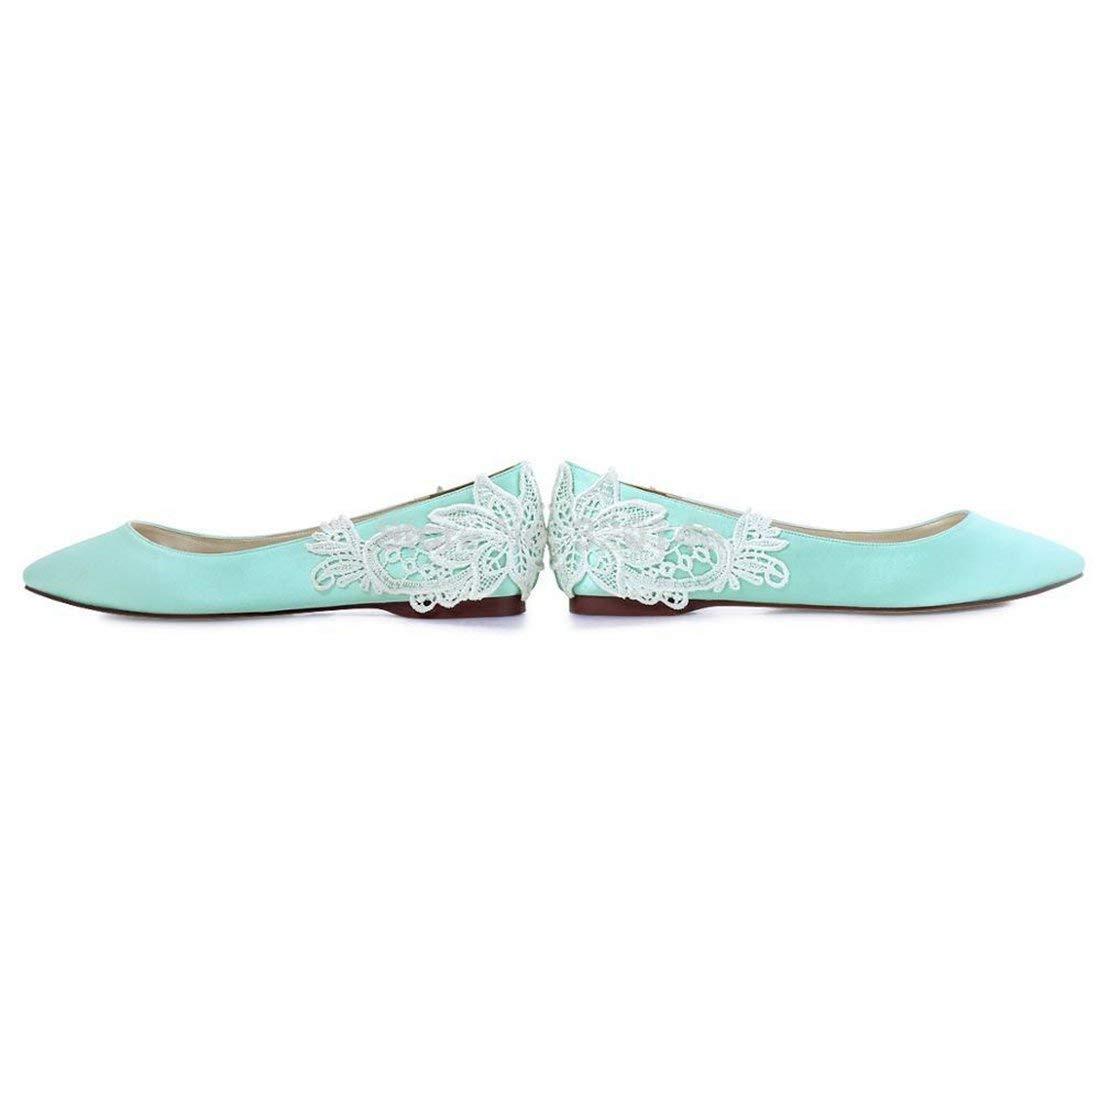 Qiusa Damen Mandel Zehe-Spitze-Blaumen-Satin-Bequeme Zehe-Spitze-Blaumen-Satin-Bequeme Zehe-Spitze-Blaumen-Satin-Bequeme handgemachte Ballett-Ebenen (Farbe   Grün Größe   3 UK) 0fae0d